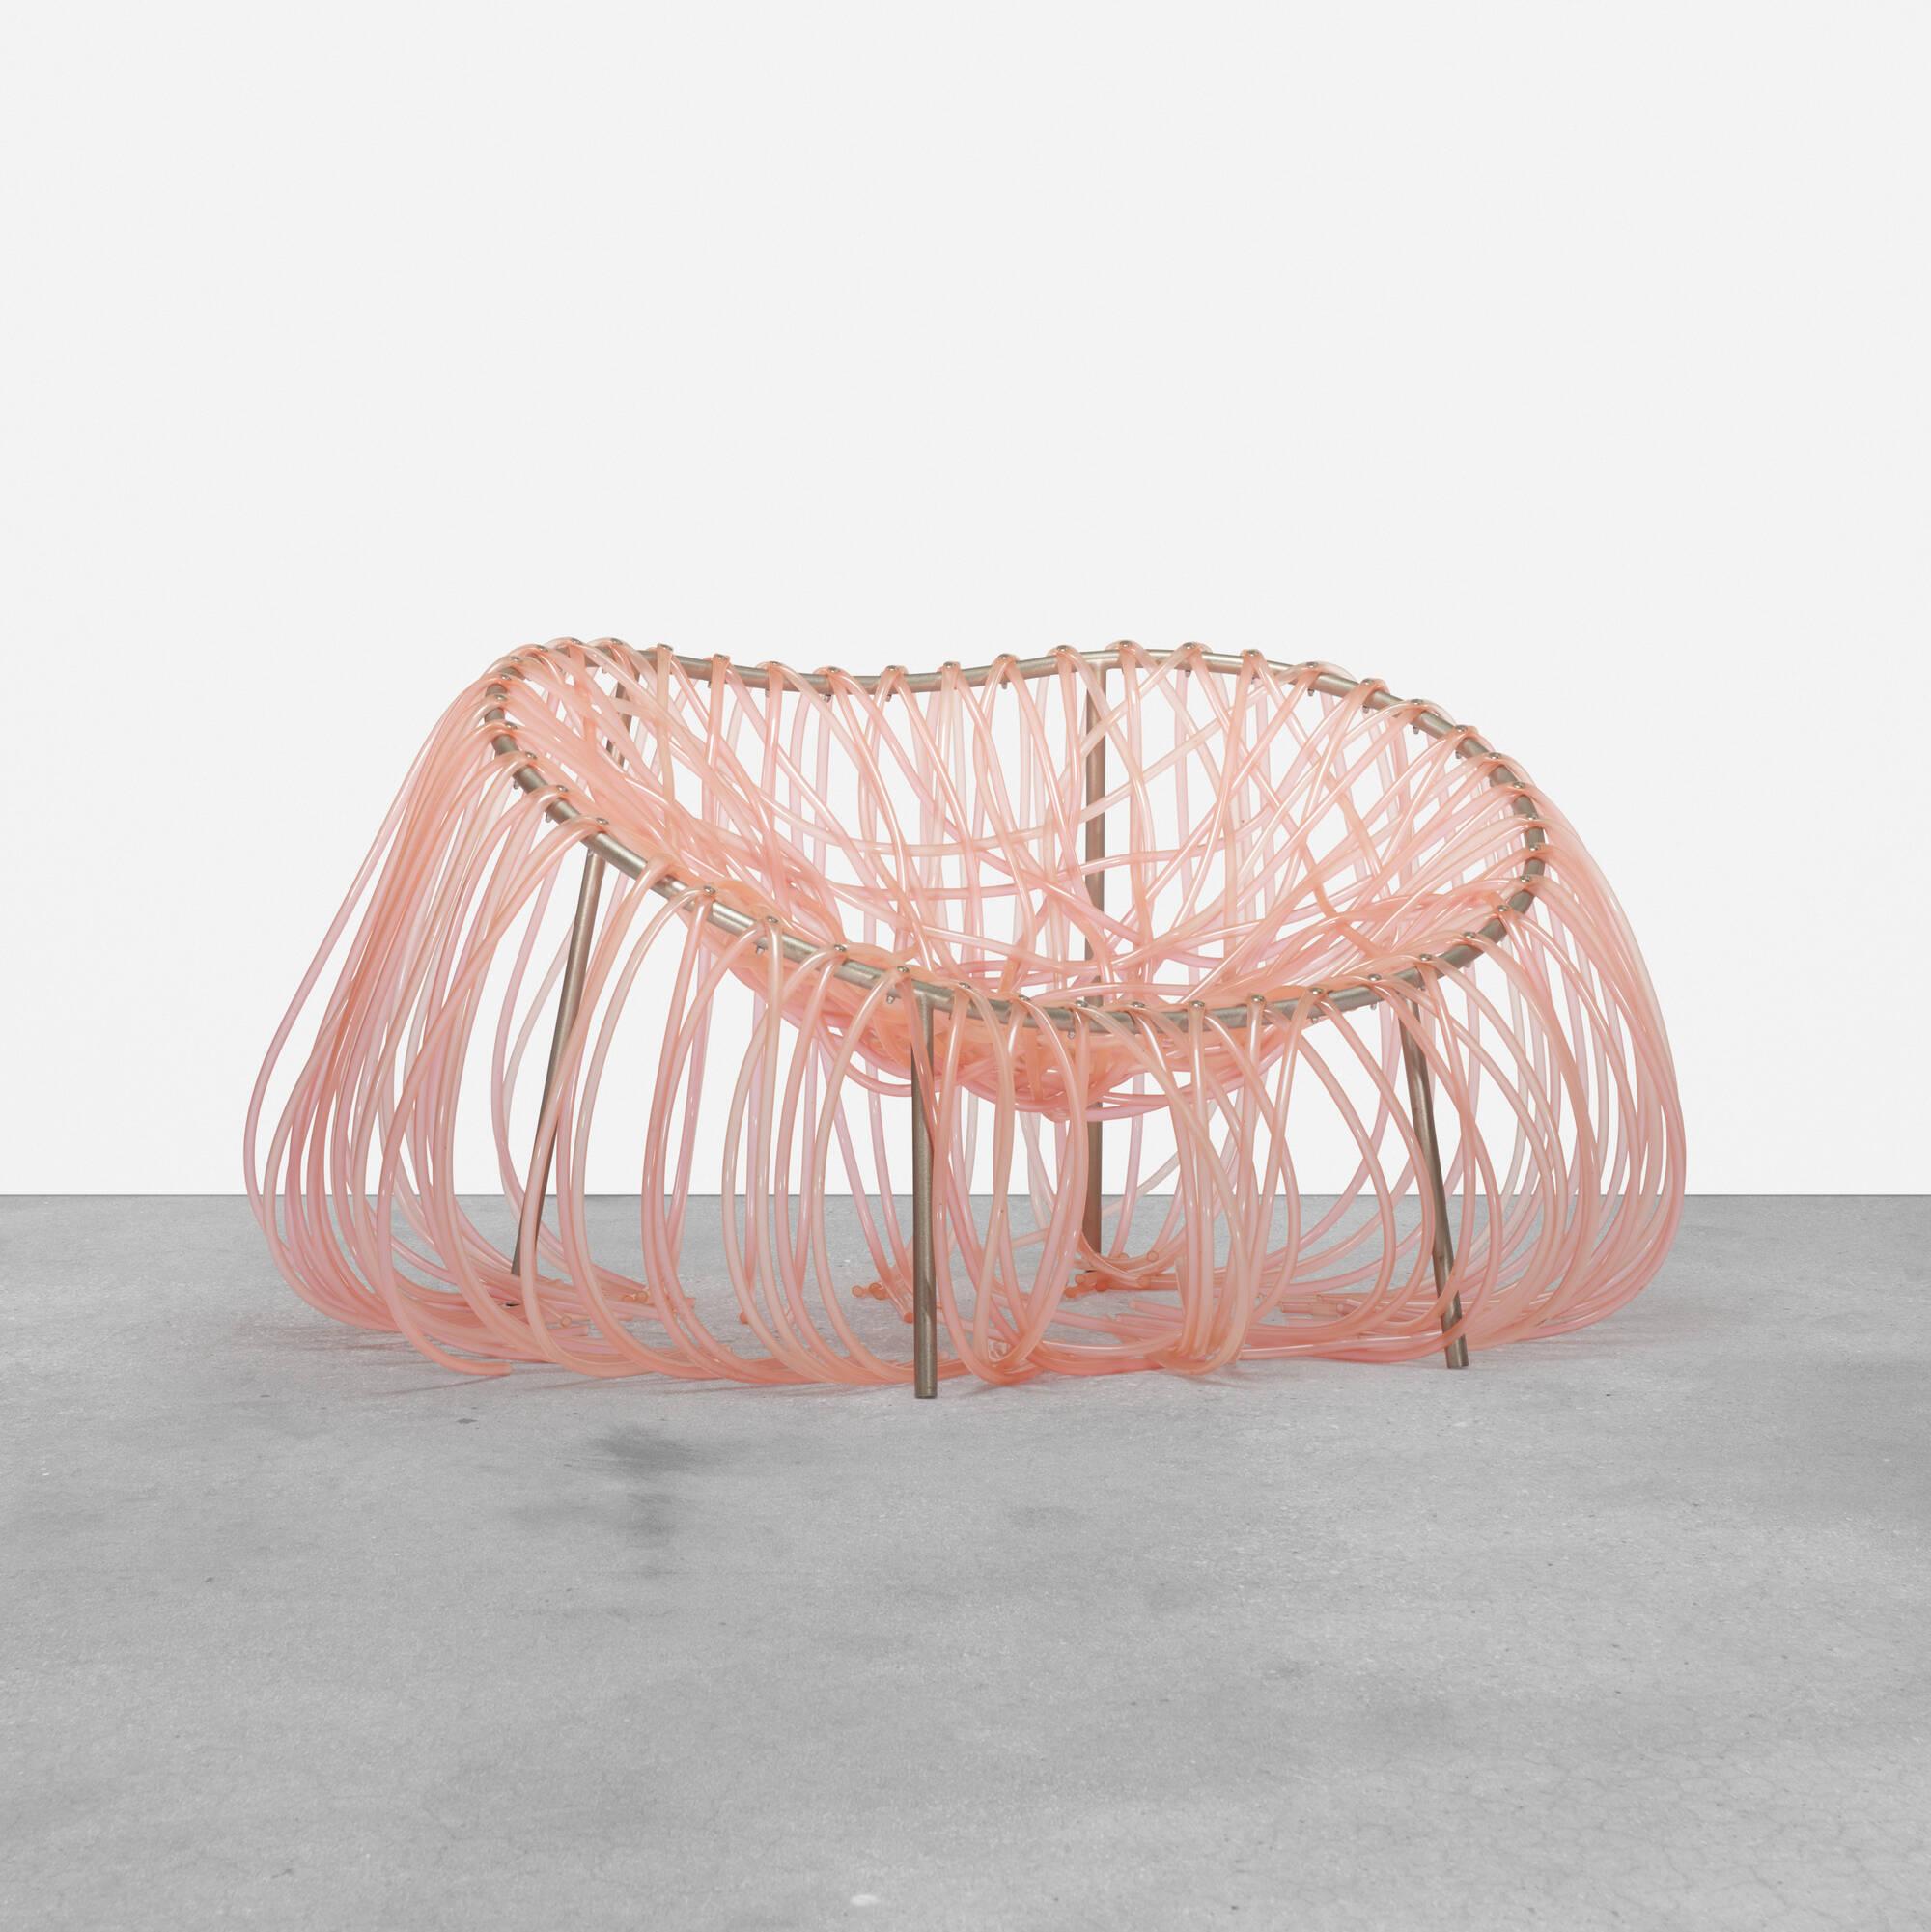 287: Fernando and Humberto Campana / Anemone chair (1 of 5)